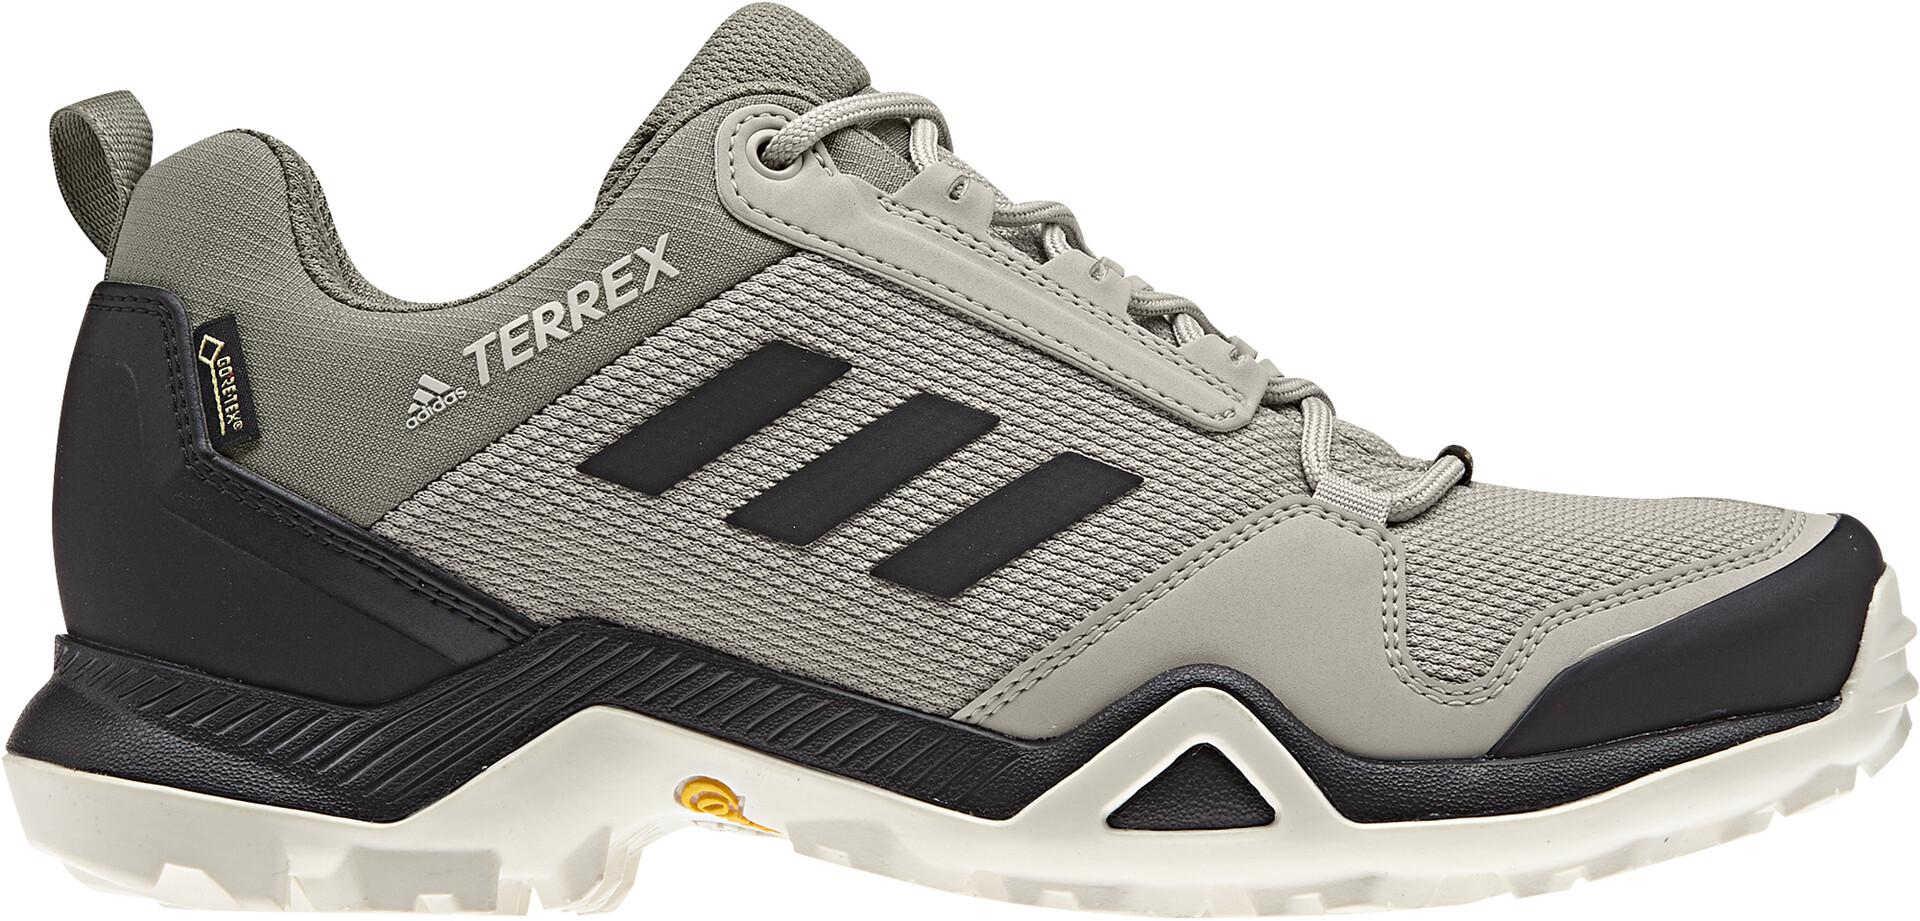 adidas TERREX AX3 GTX Schoenen Dames, sesame/core black/tracar